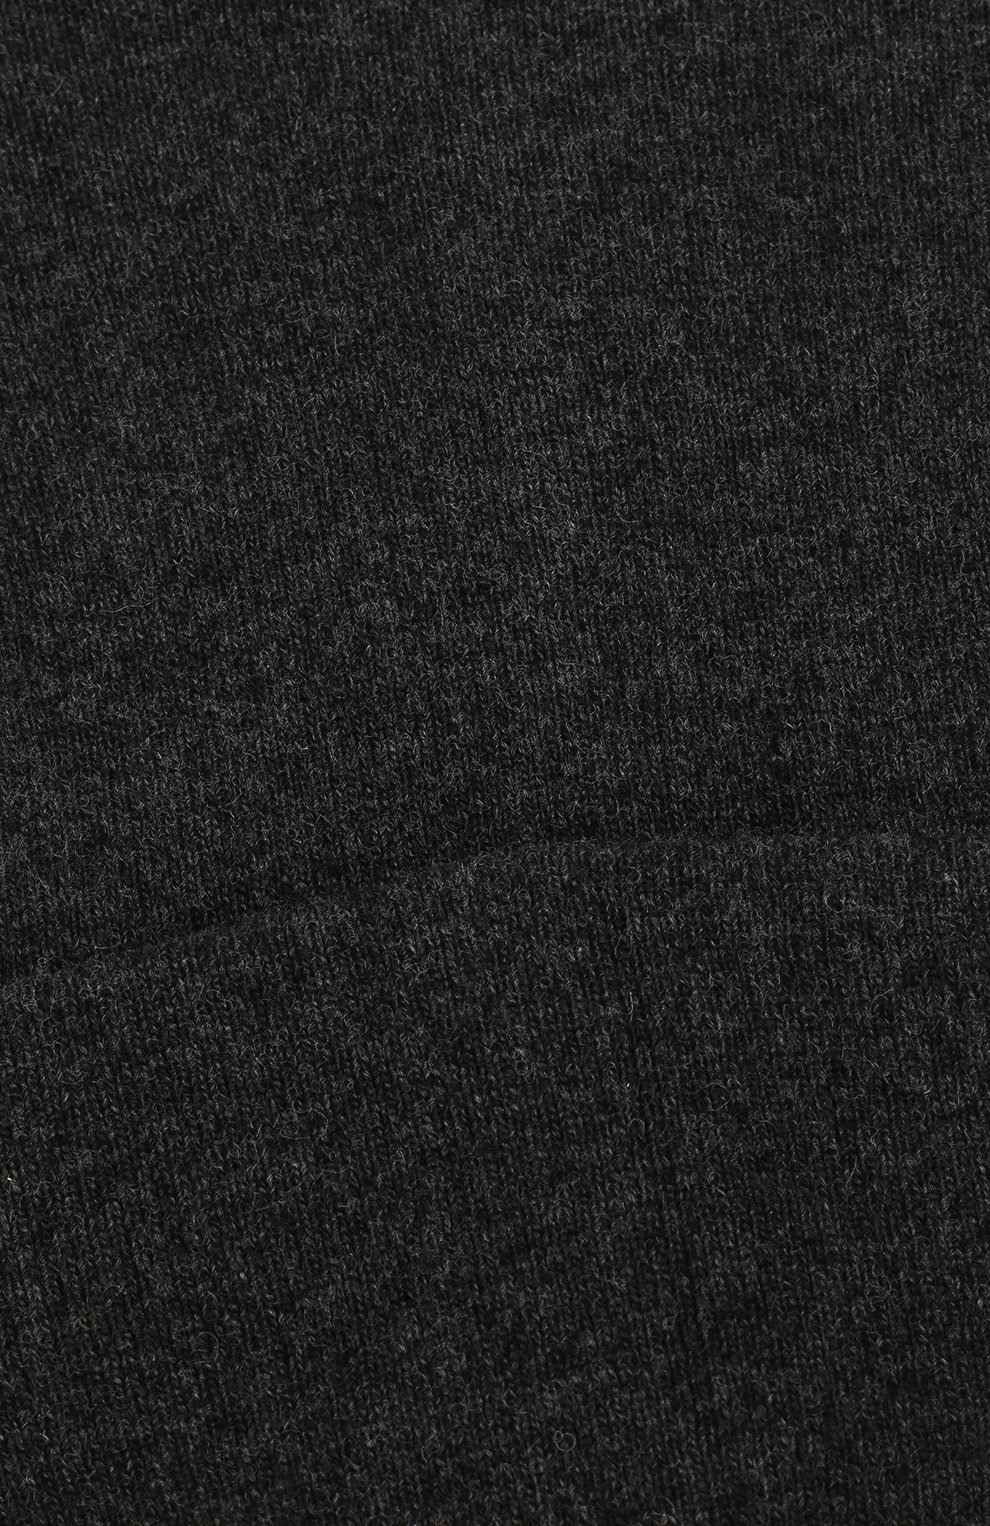 Детского шапка из шерсти и кашемира IL TRENINO темно-серого цвета, арт. 19 6408/LR | Фото 3